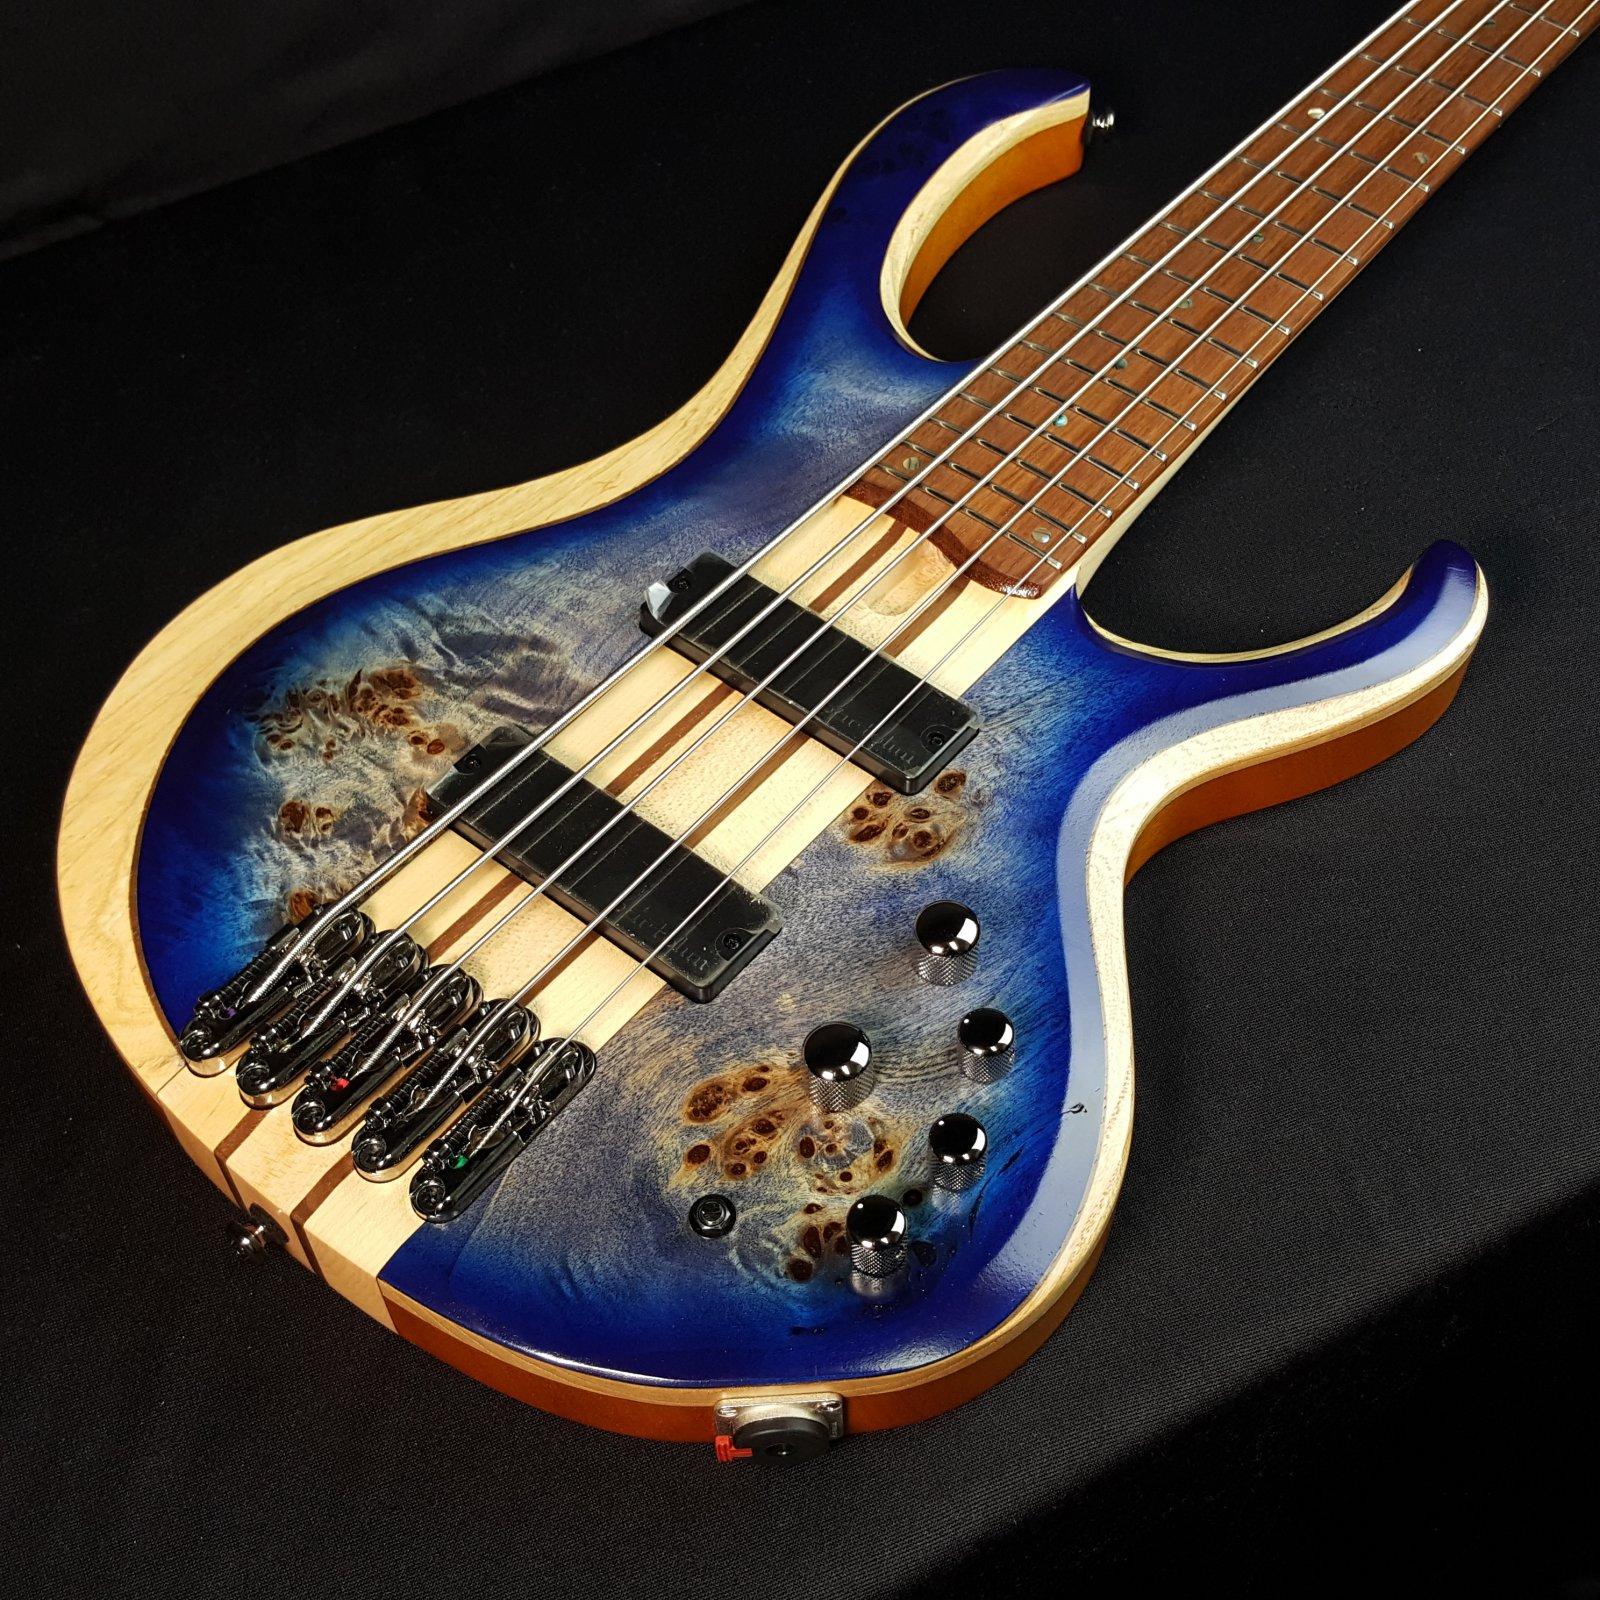 Ibanez BTB845CBL 5-String Bass Cerulean Blue Burst Low Gloss